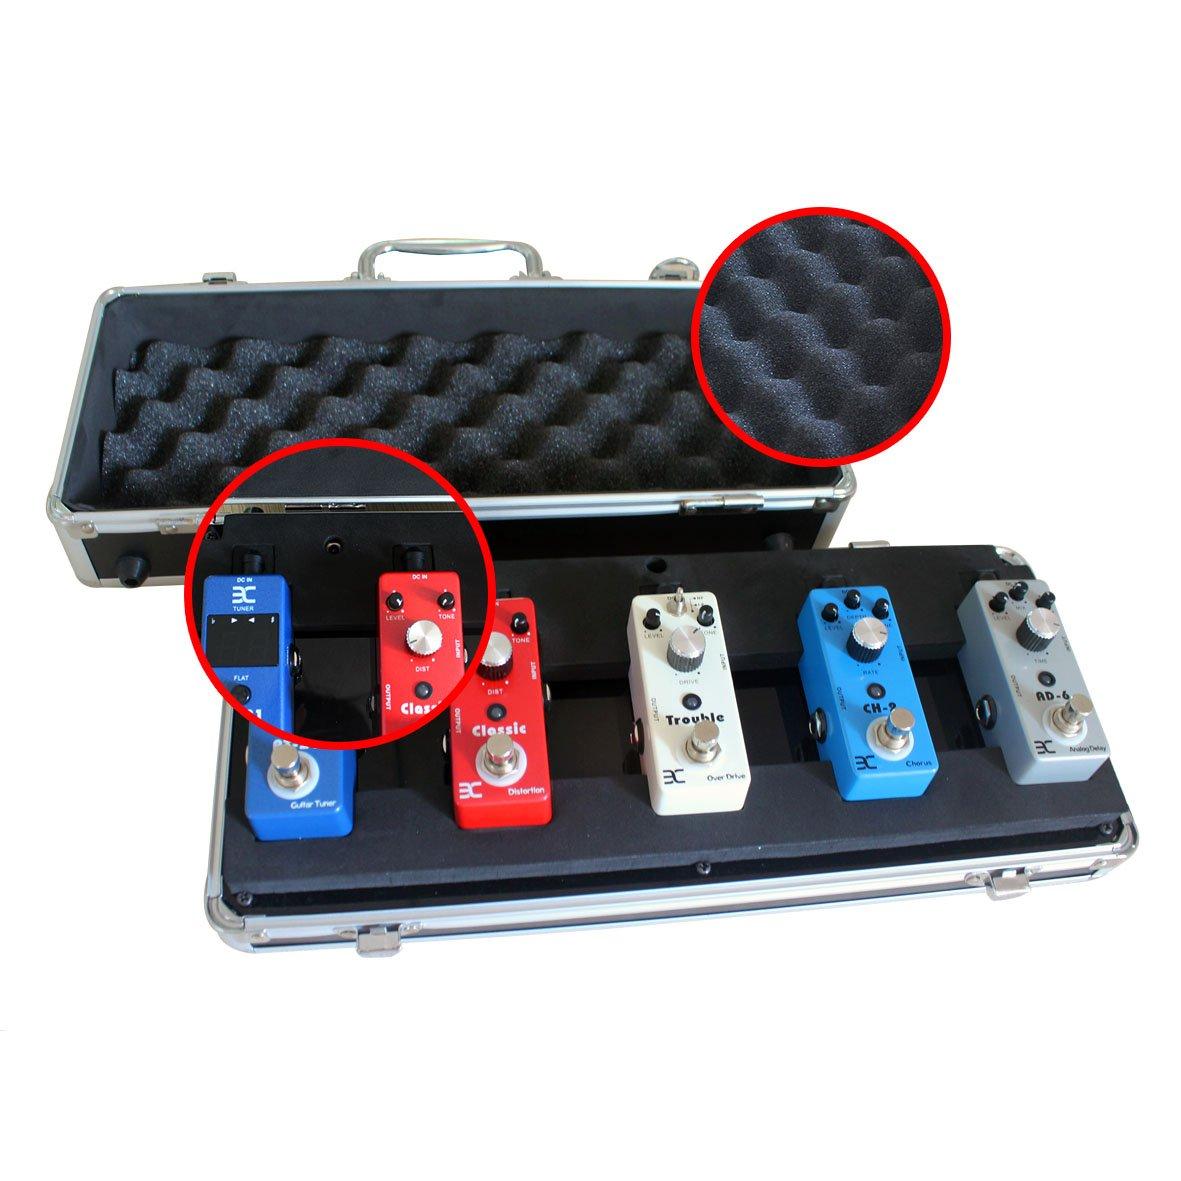 ENO EX QQ Case 5-Pedal Pedalboard/Electronic Guitar Effects Pedals Flight Case by Effects Pedals Flight Case (Image #4)